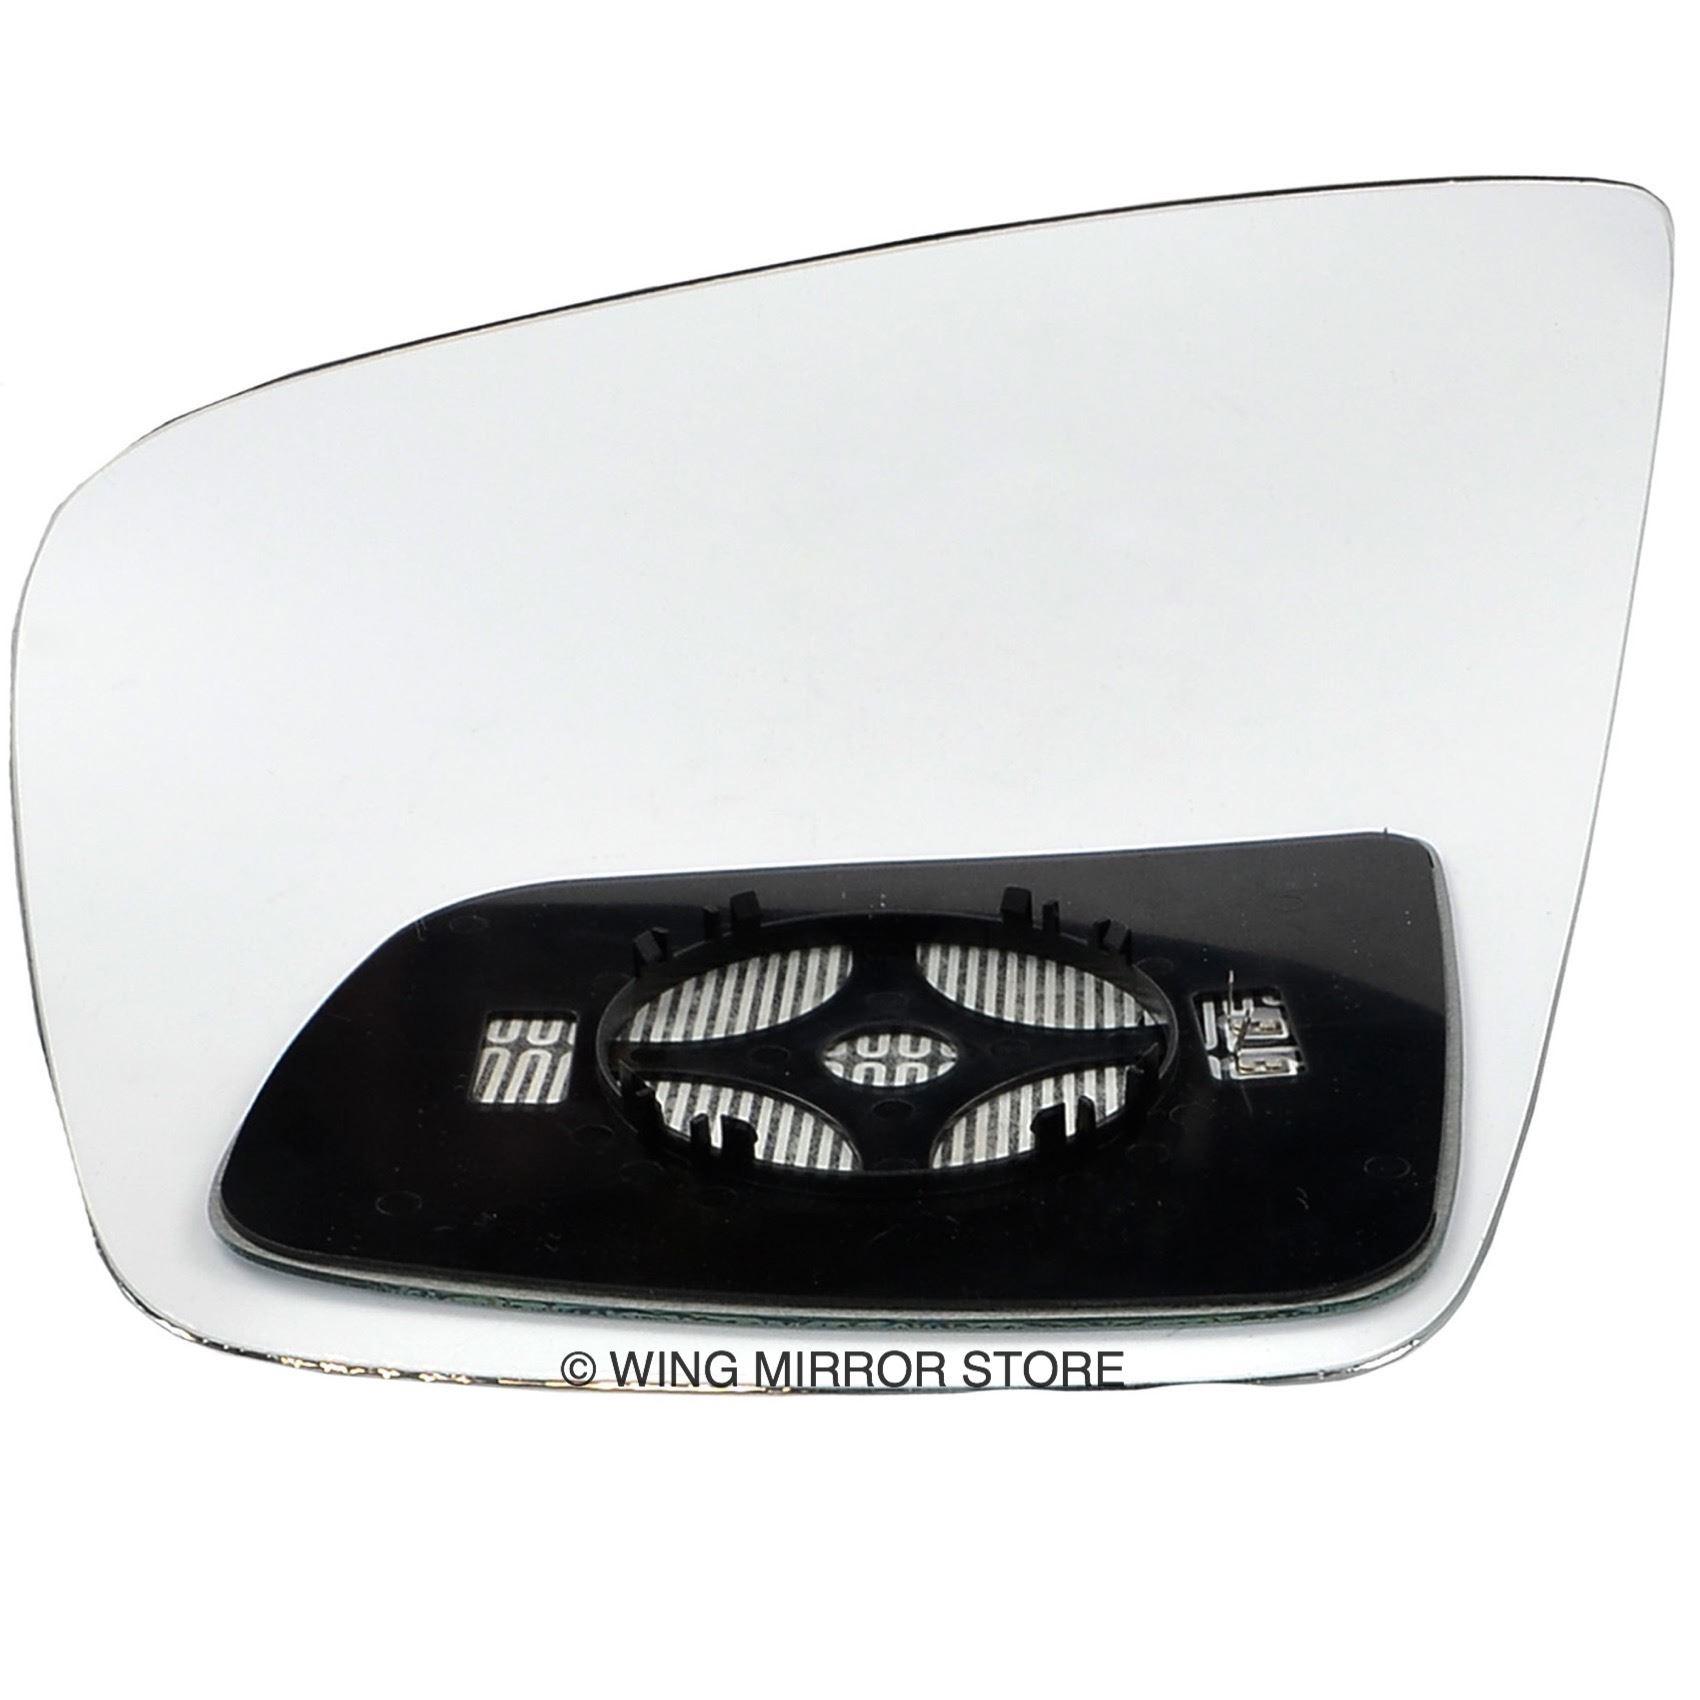 Maxgear Câble D/'allumage zündleitungssatz Silicone Phrase pour FORD Capri ISUZU LOTUS EXCEL